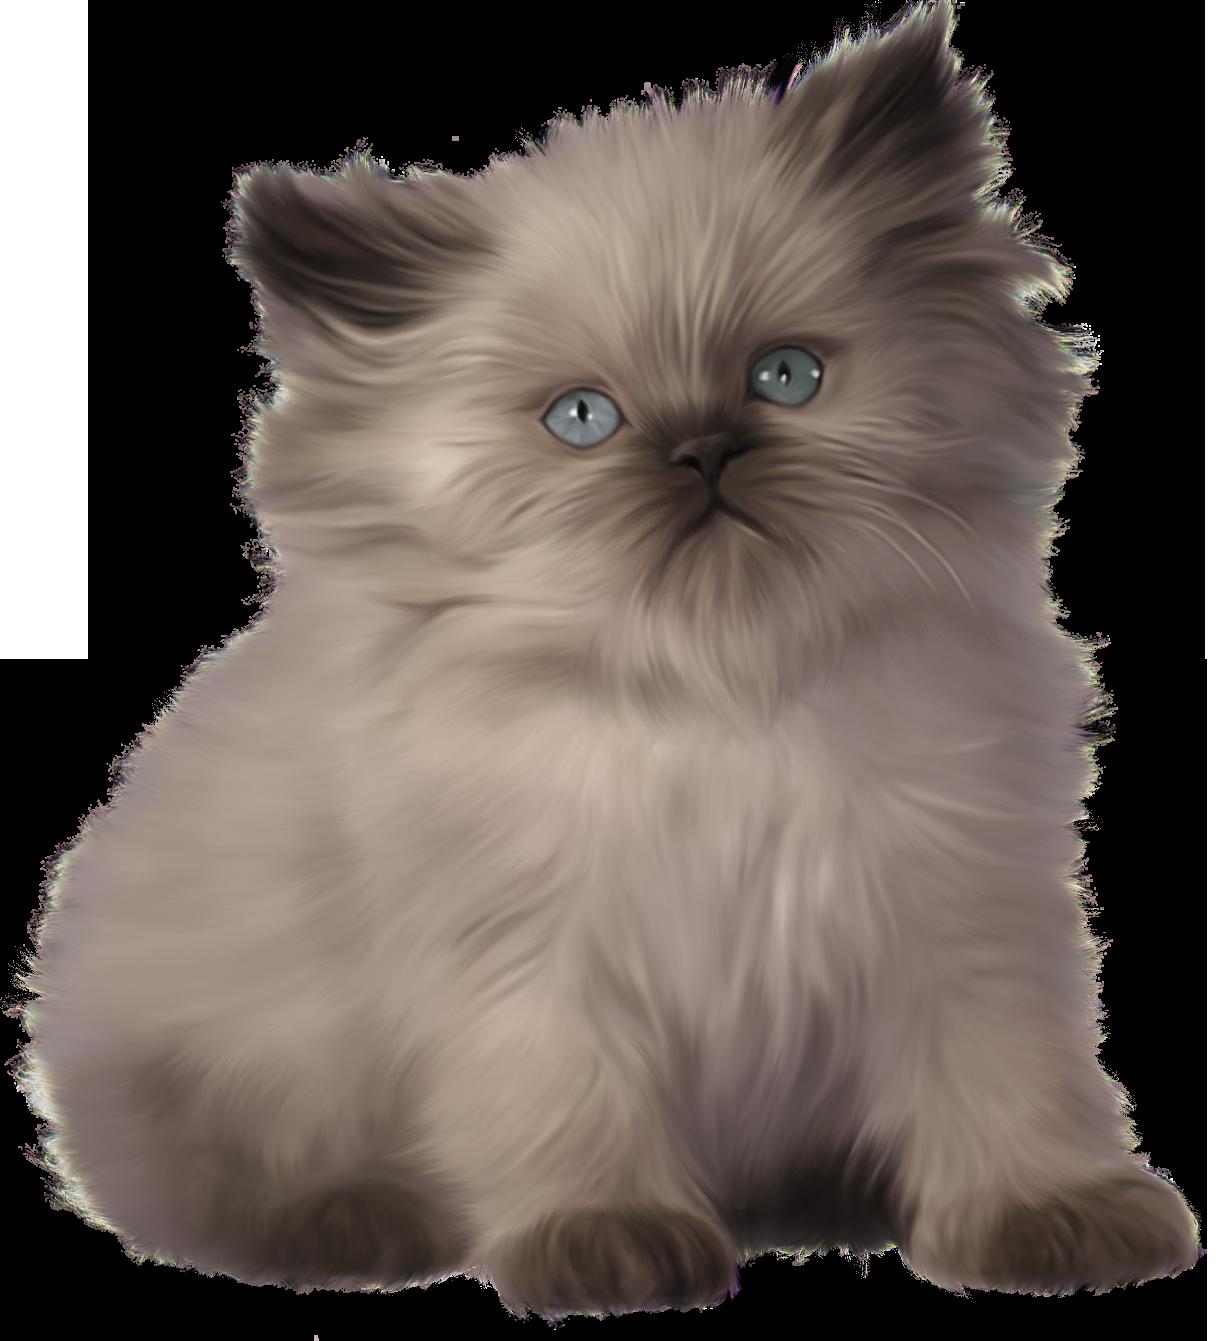 Png best web. Kitten clipart file